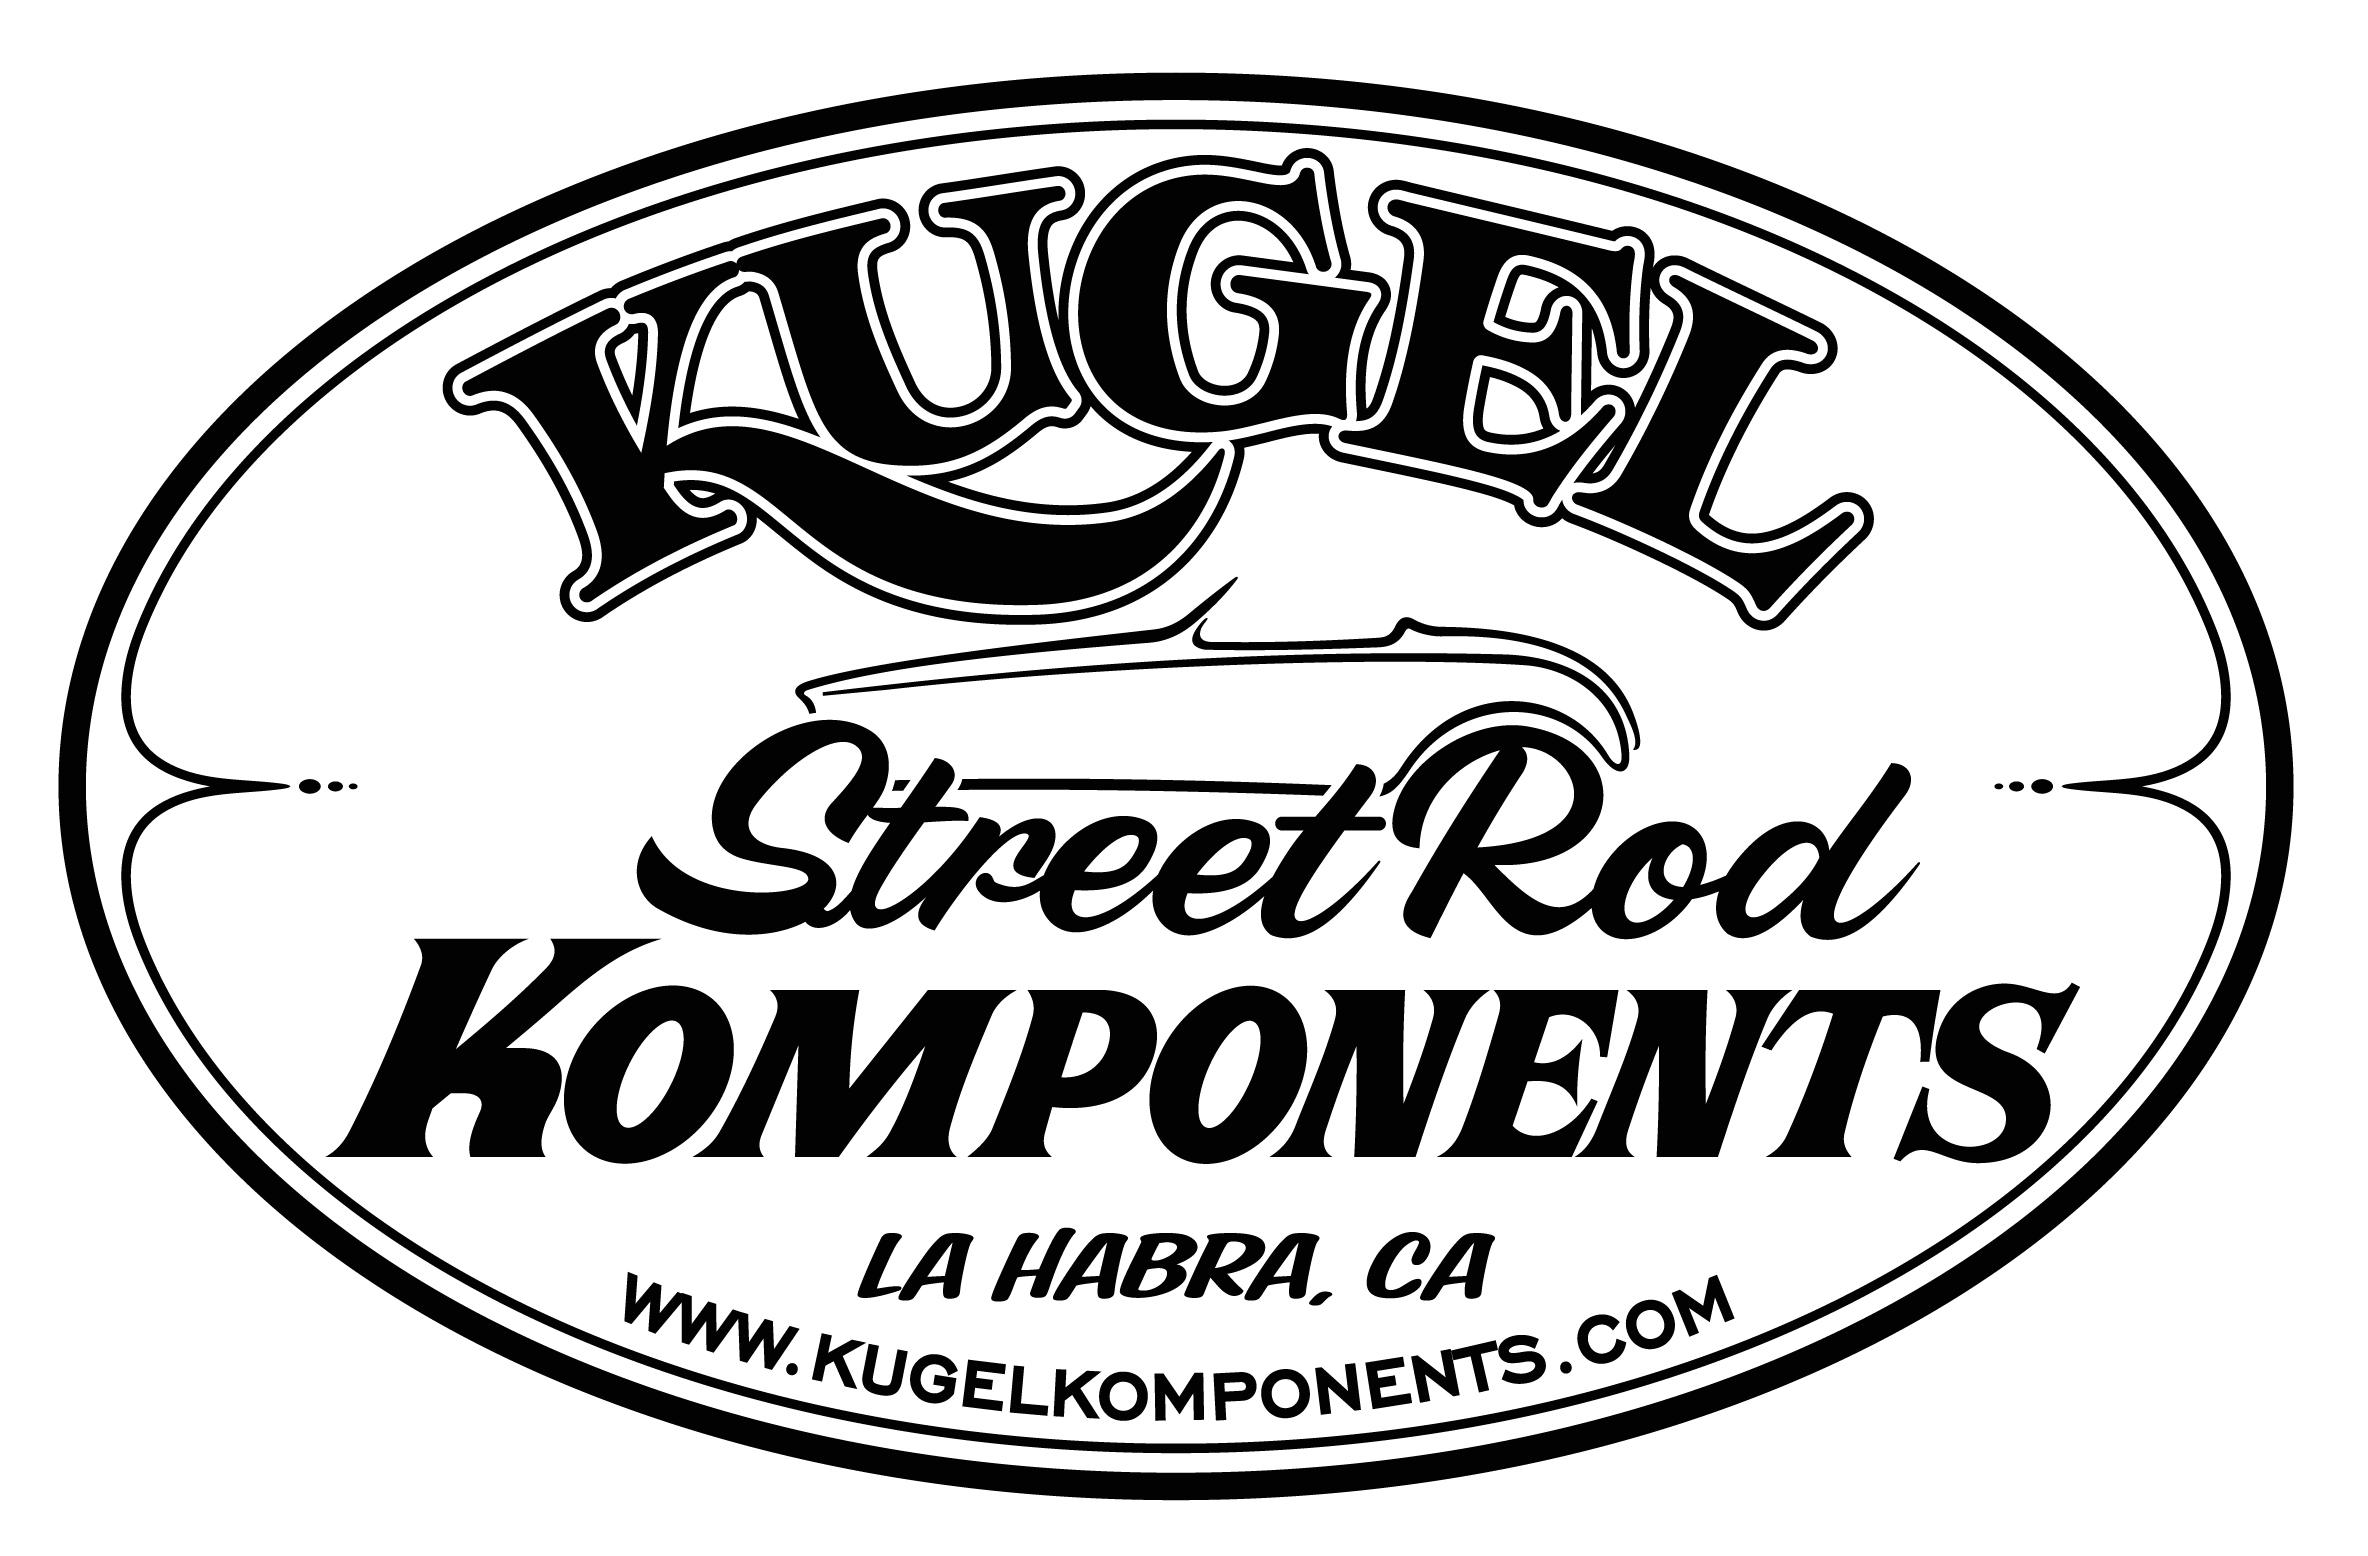 kugel-komponents-logo-2016.jpg